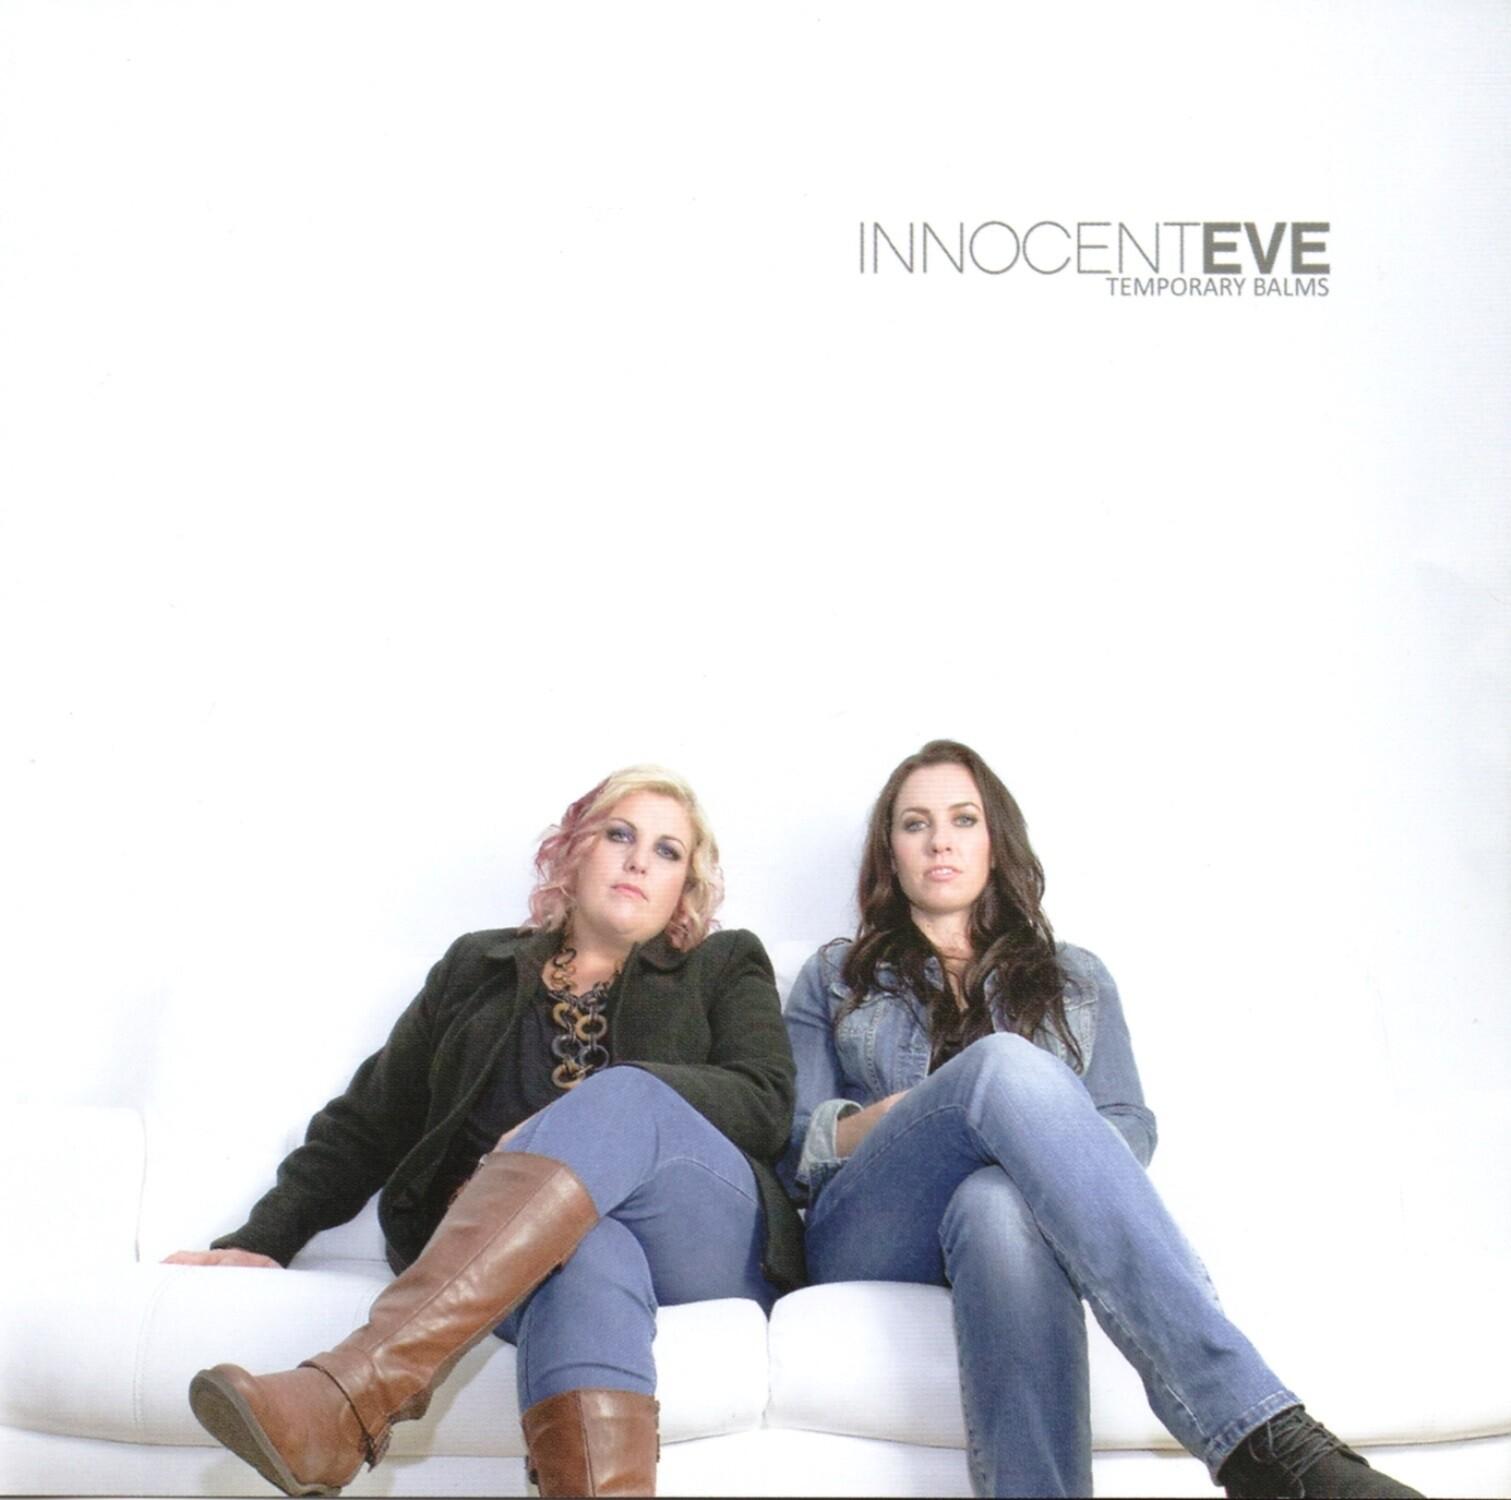 Innocent Eve - Every Woman